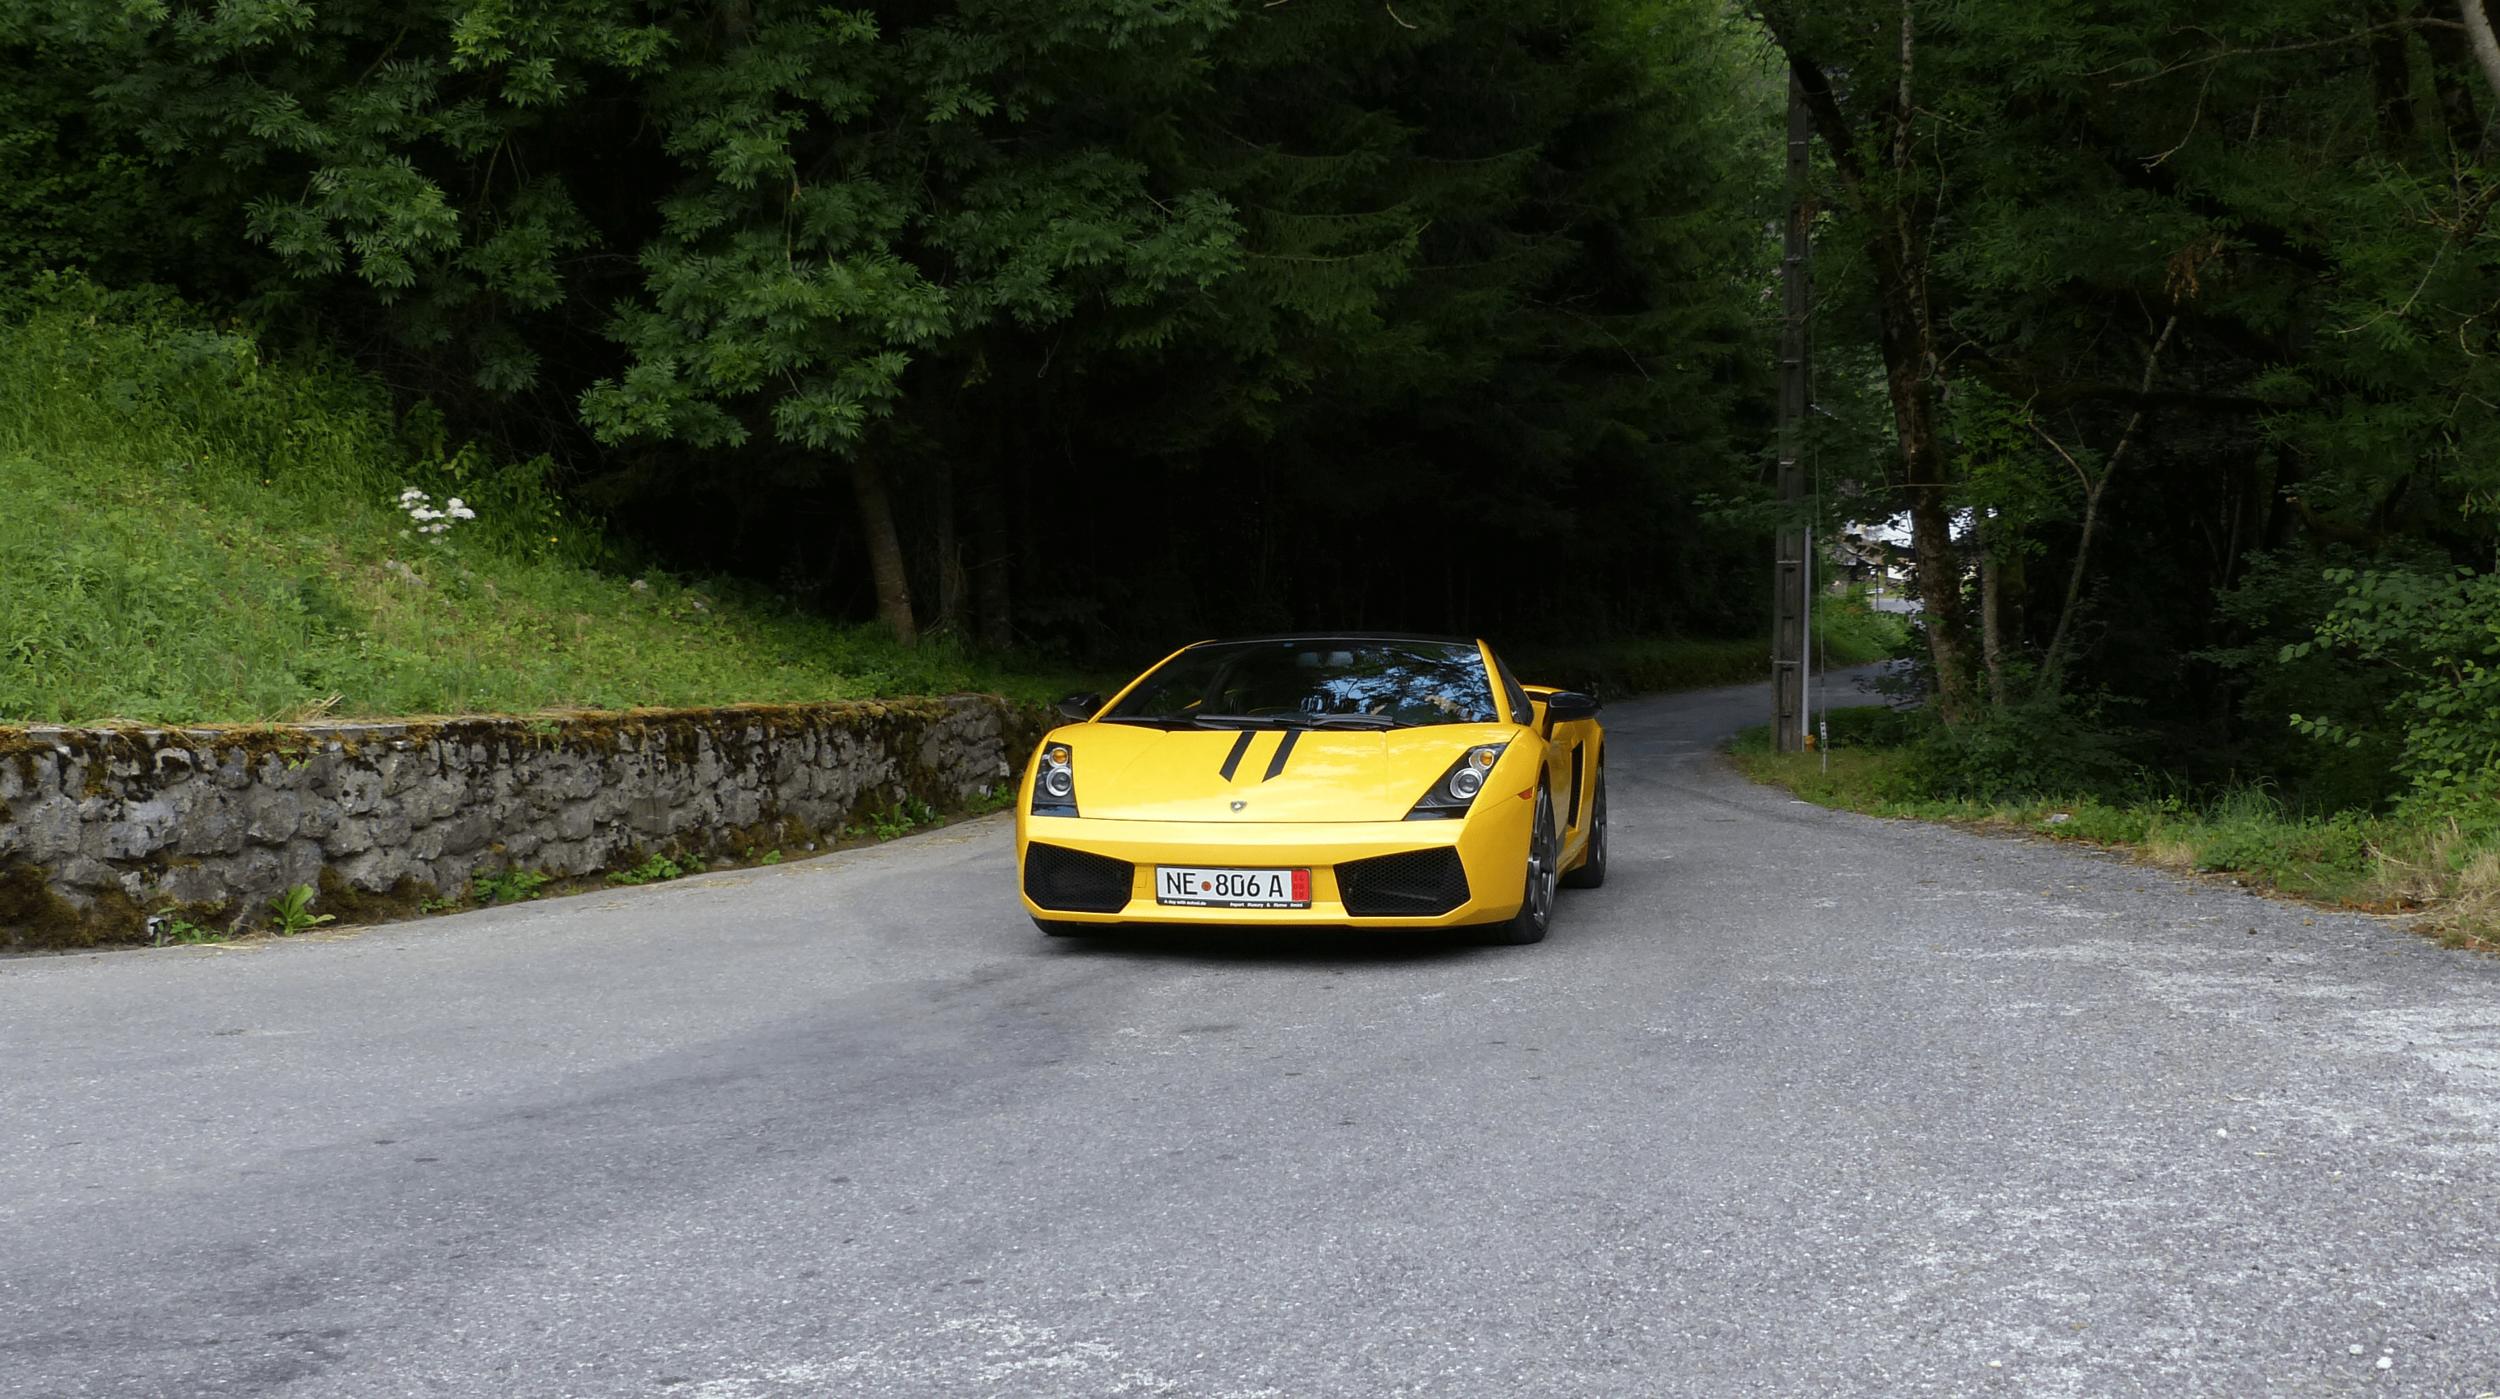 lamborghini_gallardo_se_supercar_thegoodcar_recherche_conseil_negociation_verification_automobile